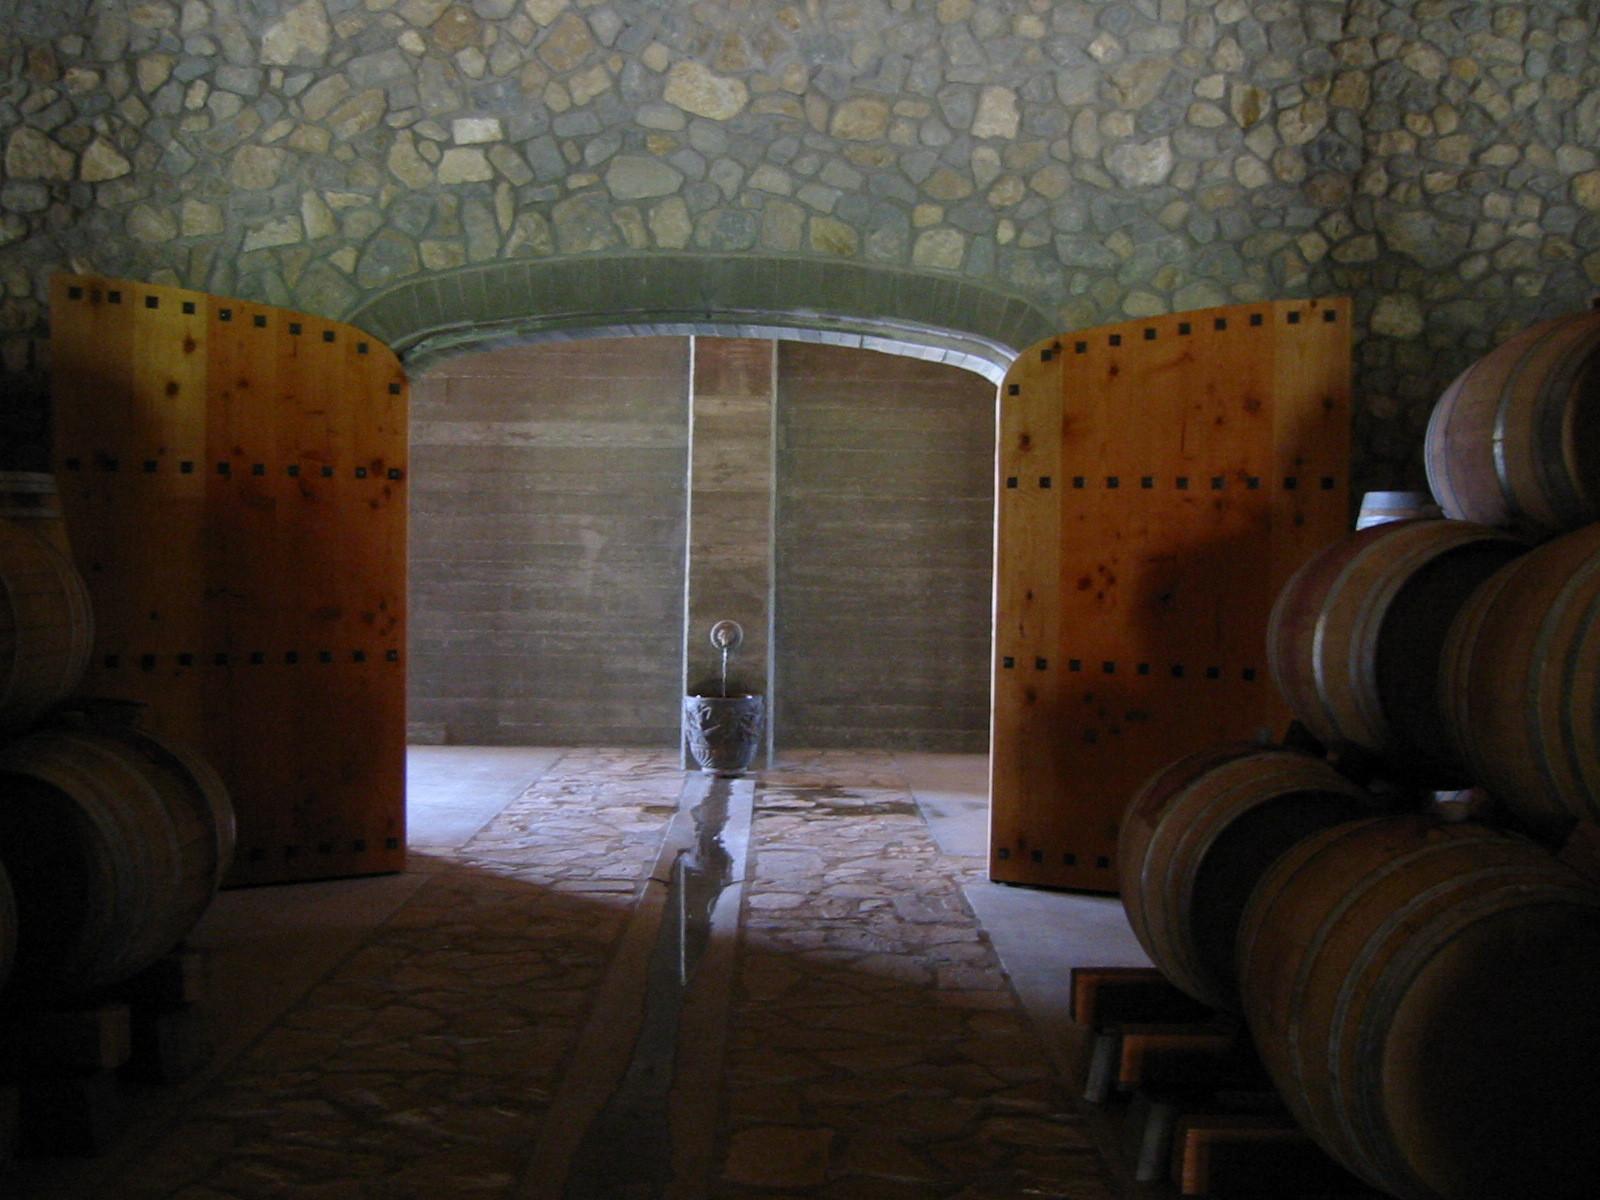 95-02-Sanford-Winery-Image-016